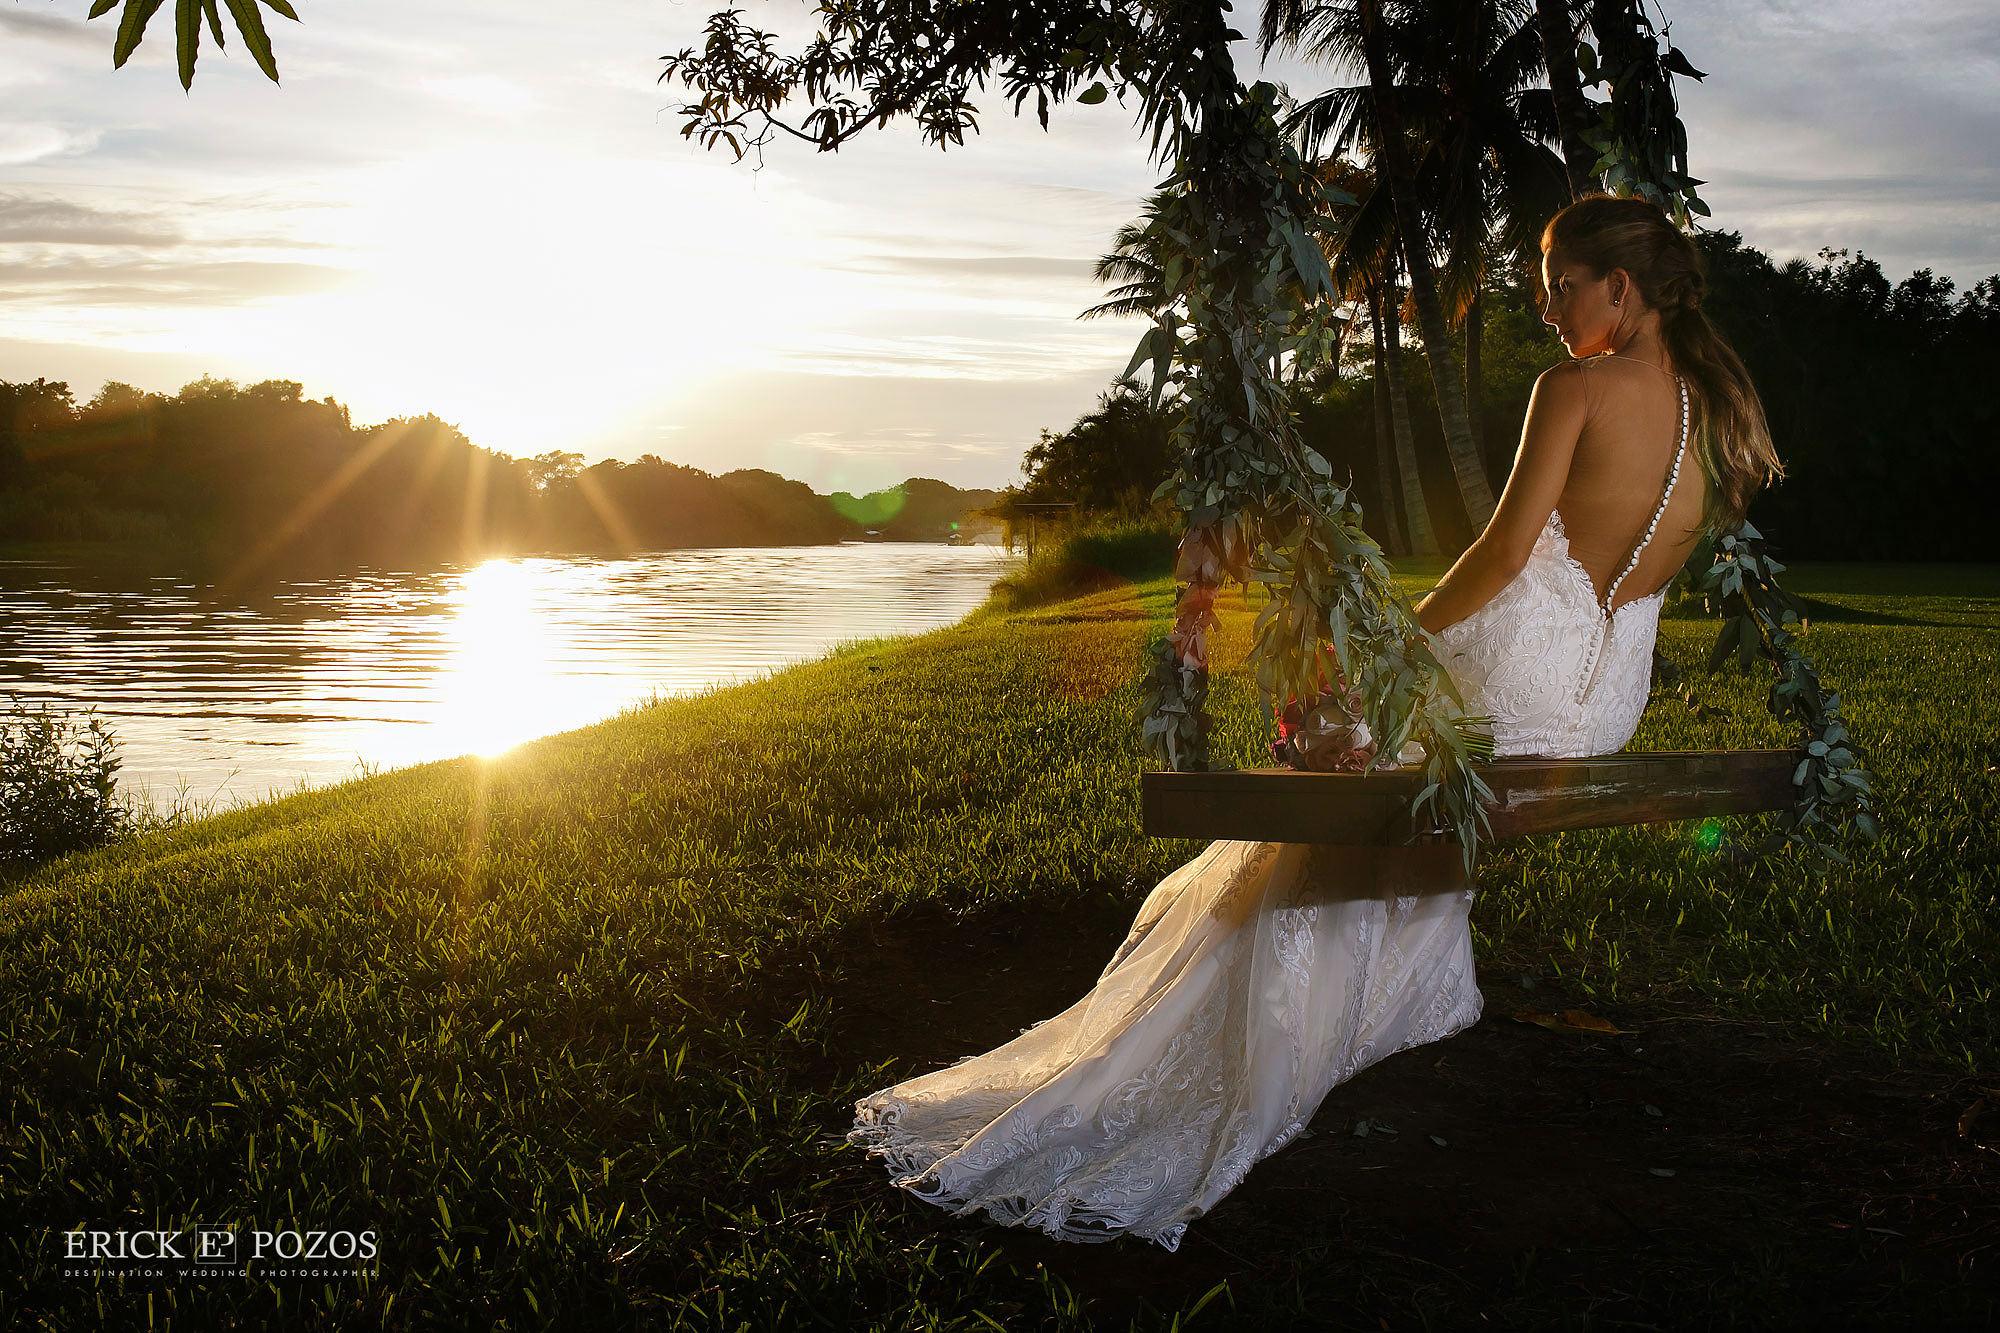 erick-pozos-fotografo-de-bodas-16